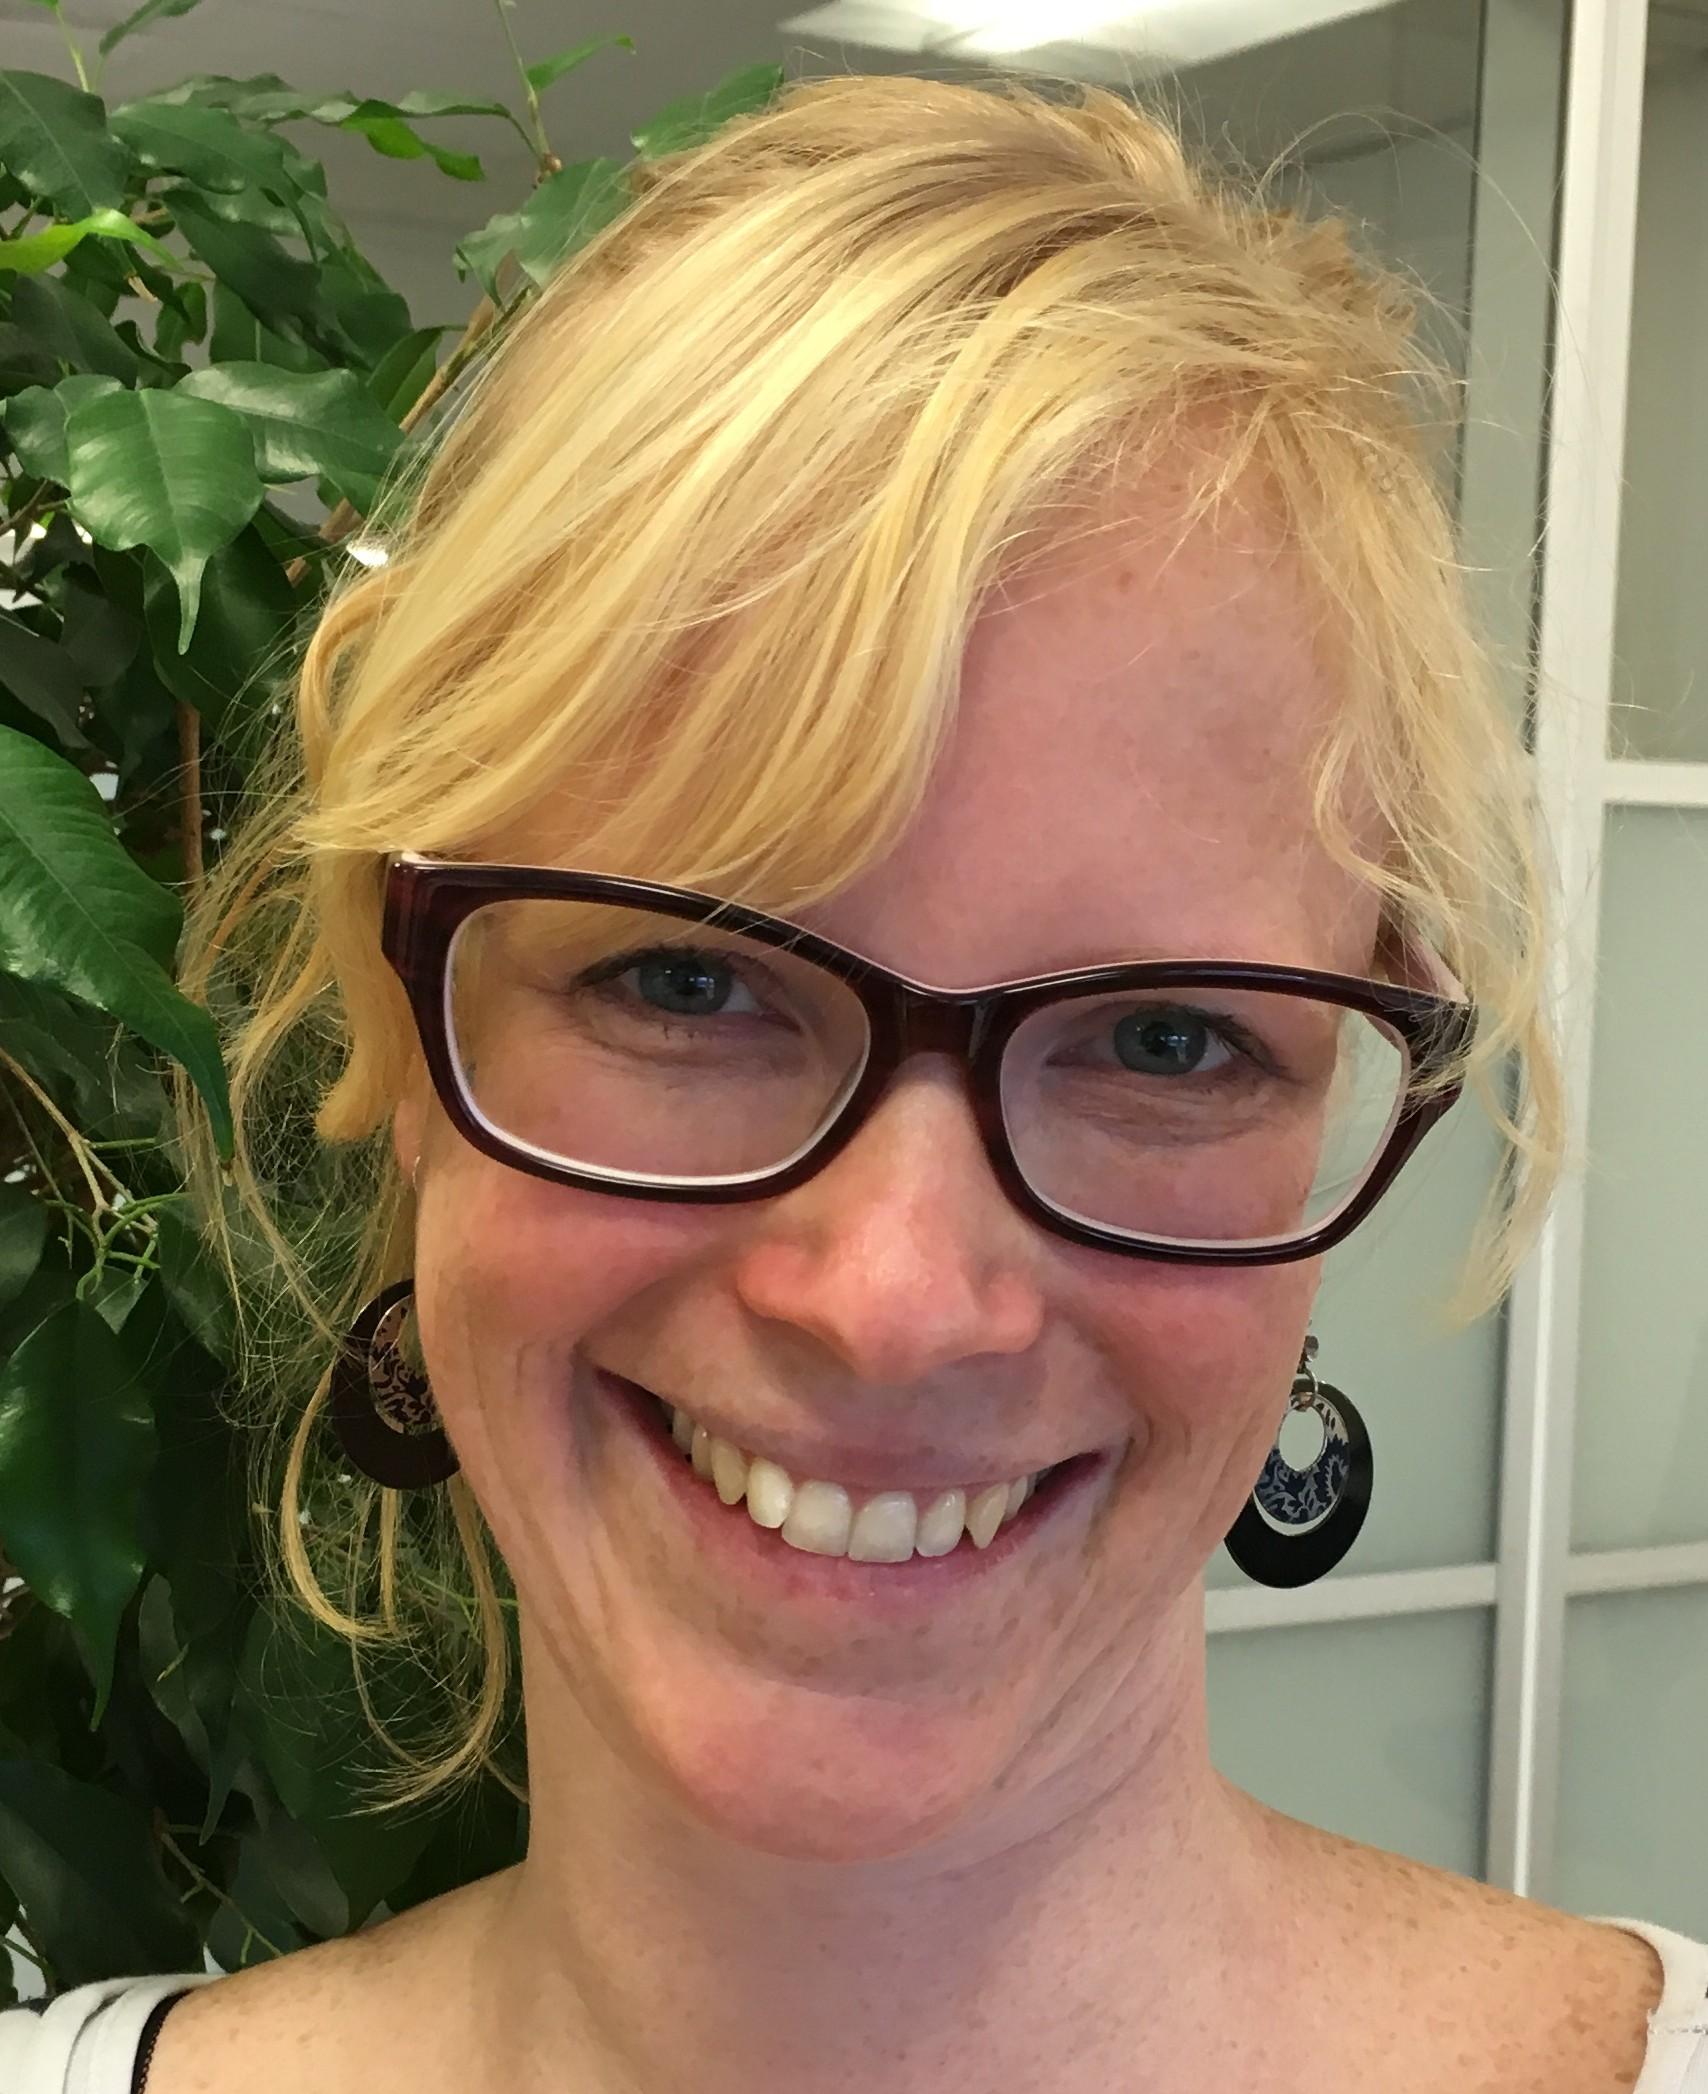 Daniëlle Leuning, MD, PhD